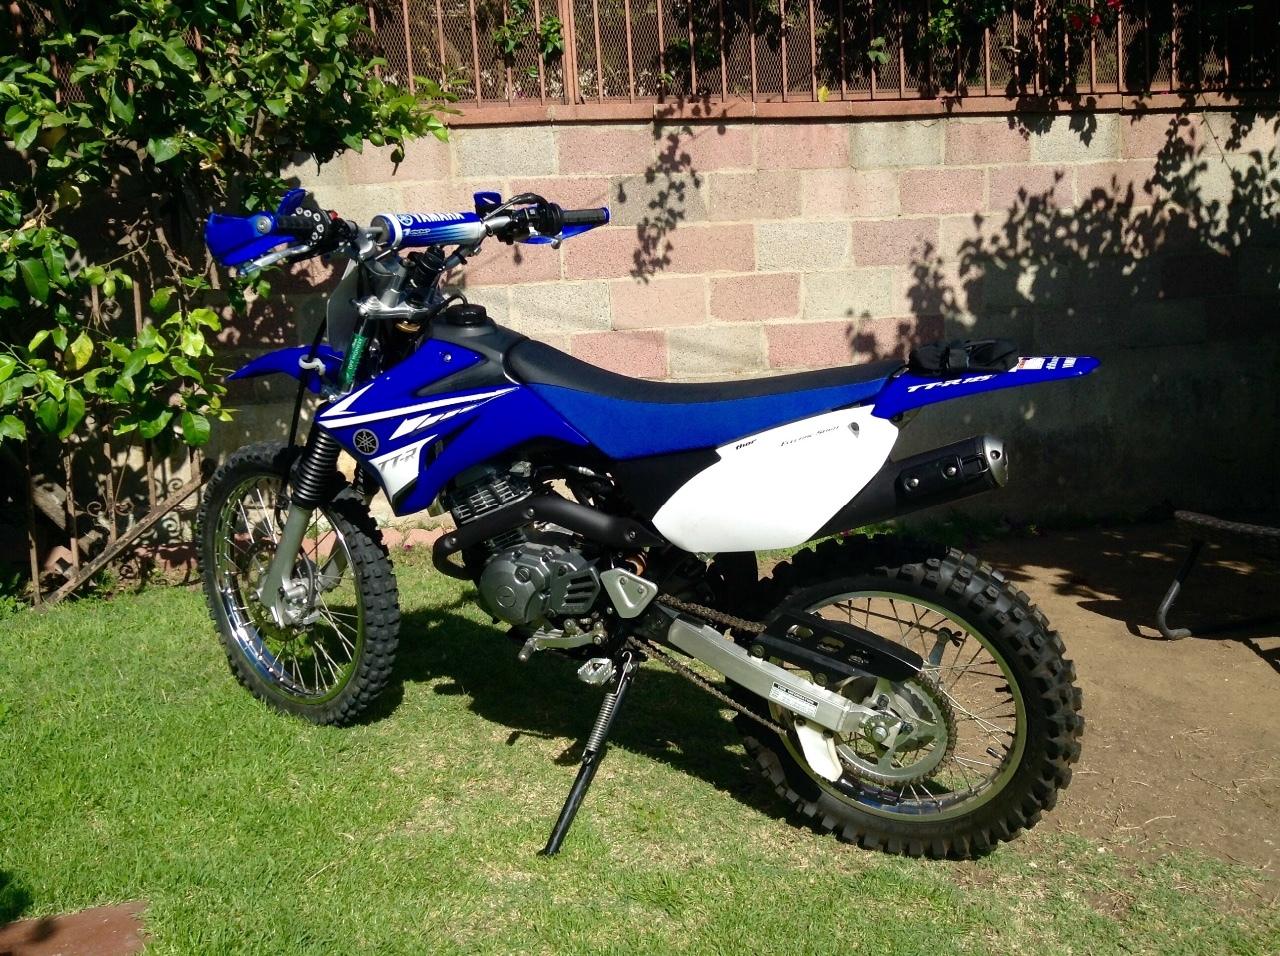 2008 Yamaha TT-R125, Los Angeles CA - - Cycletrader com